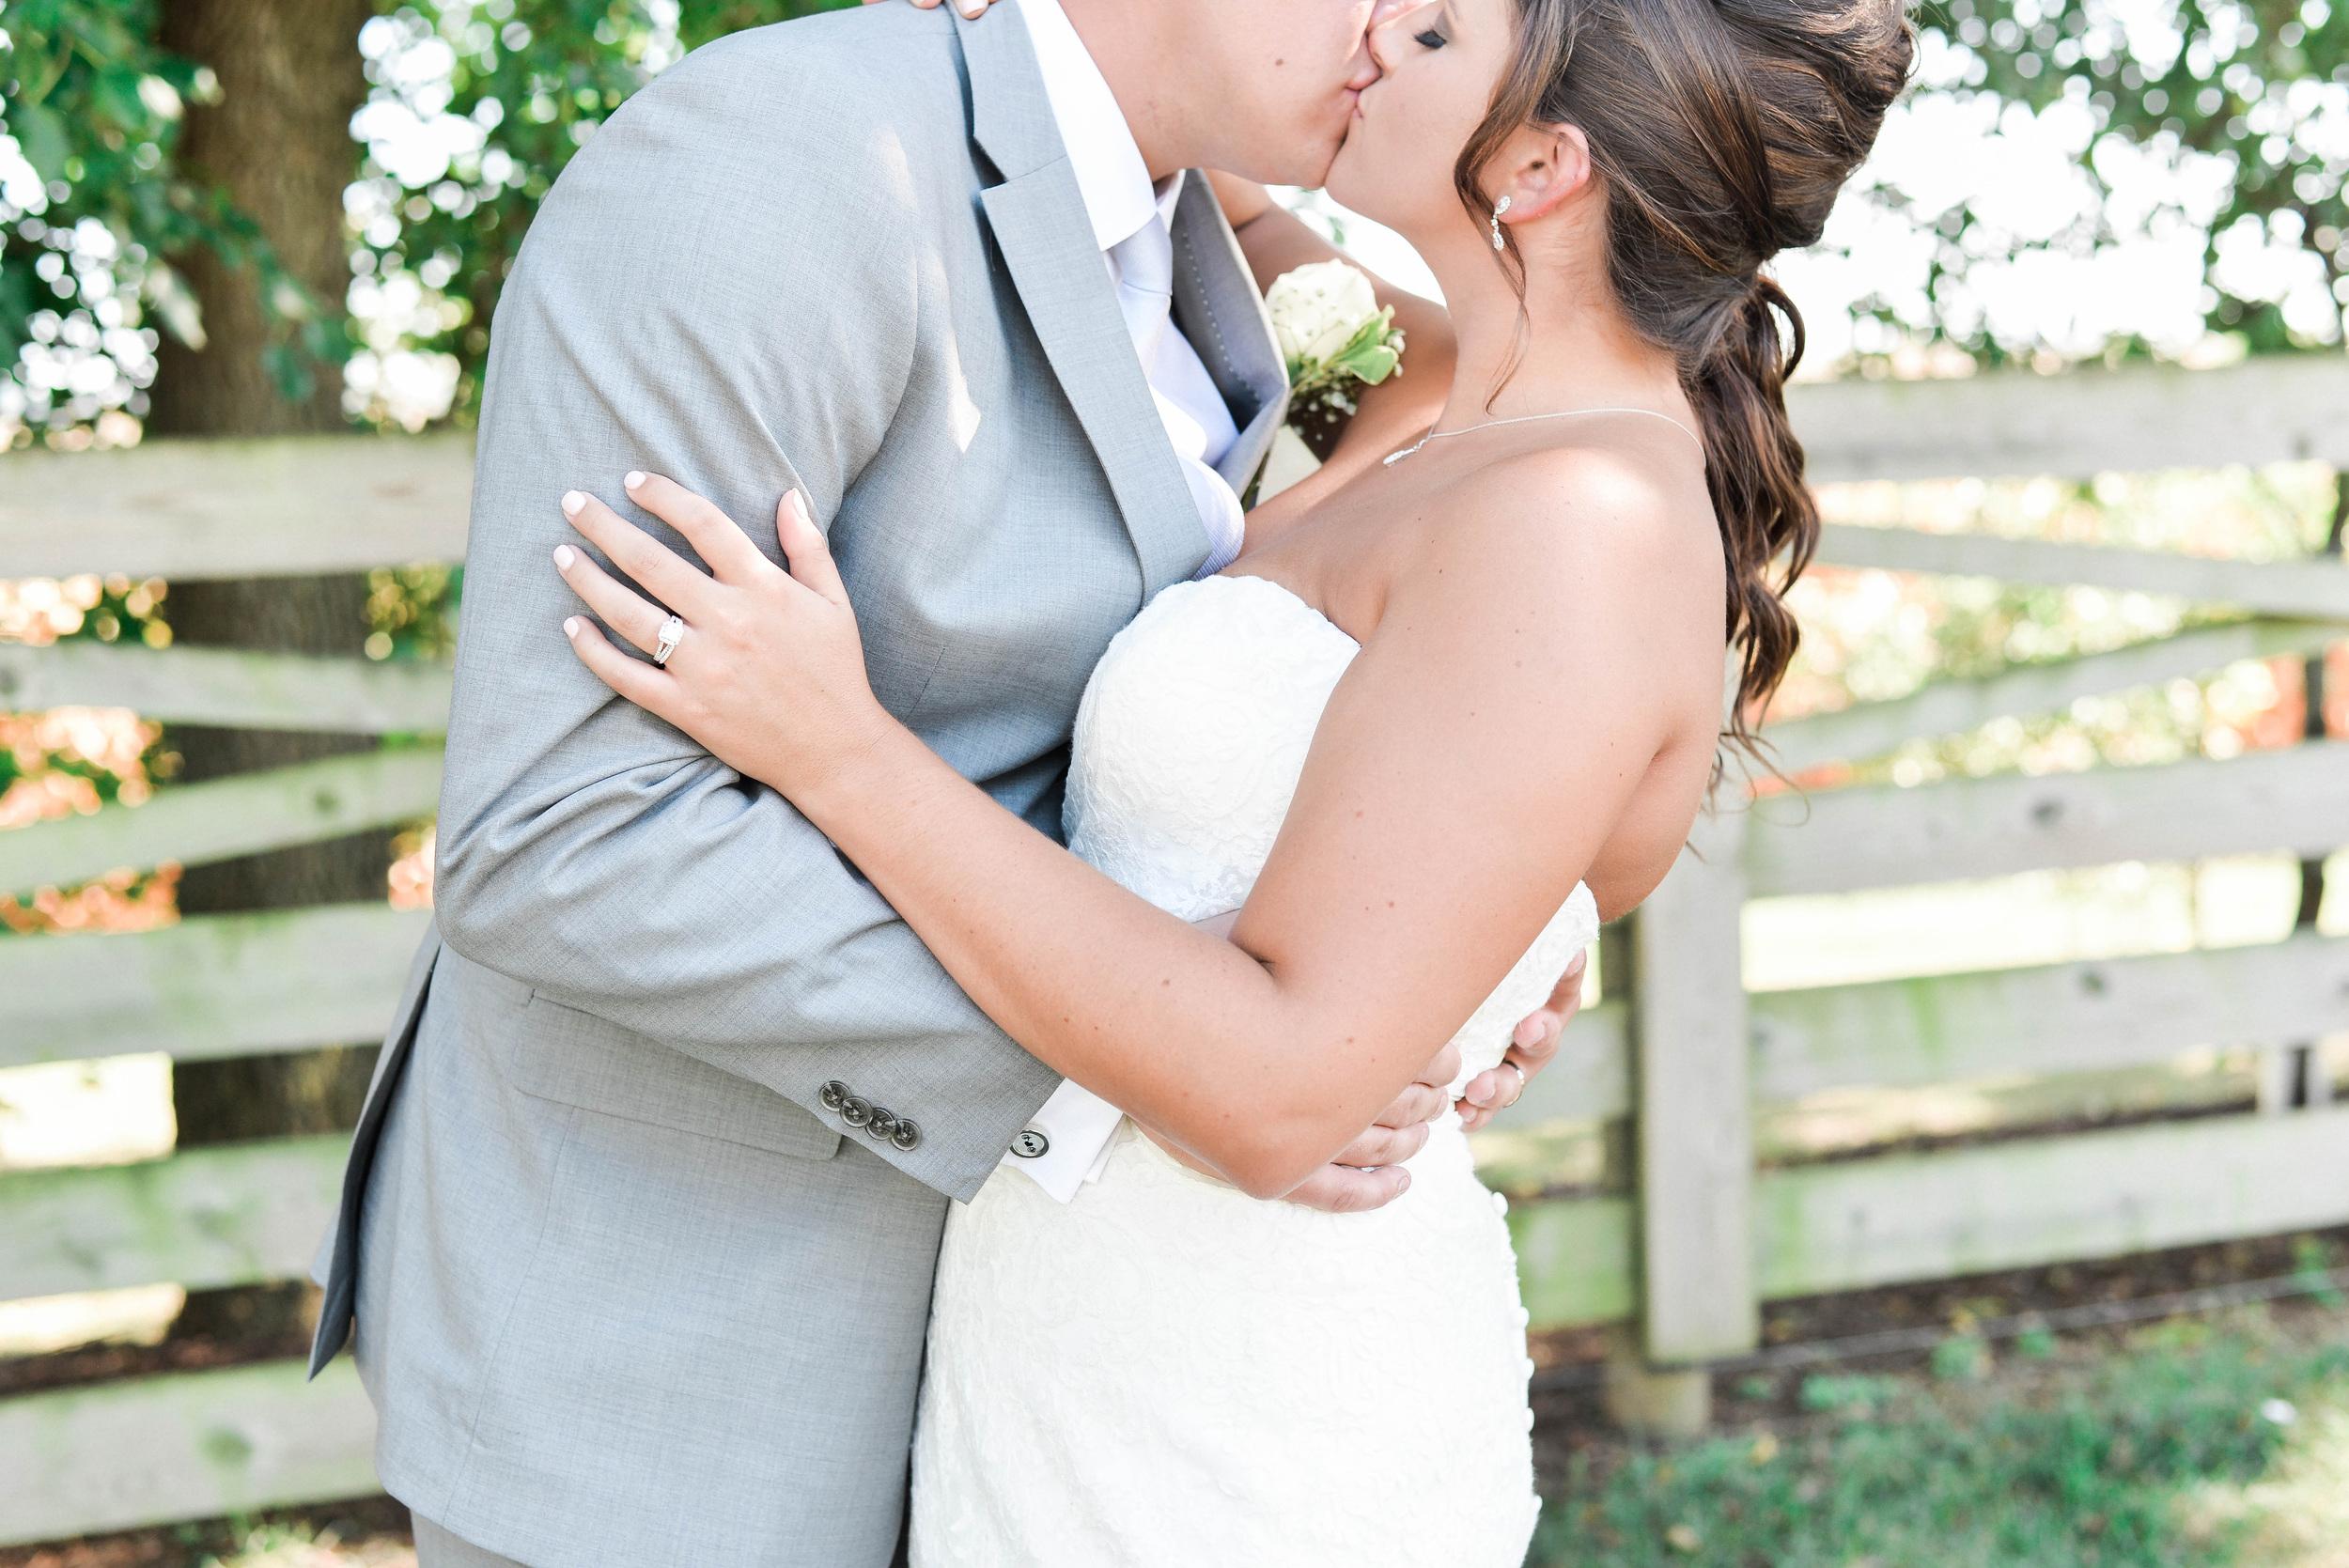 Cooksey-Beam Wedding-911.jpg